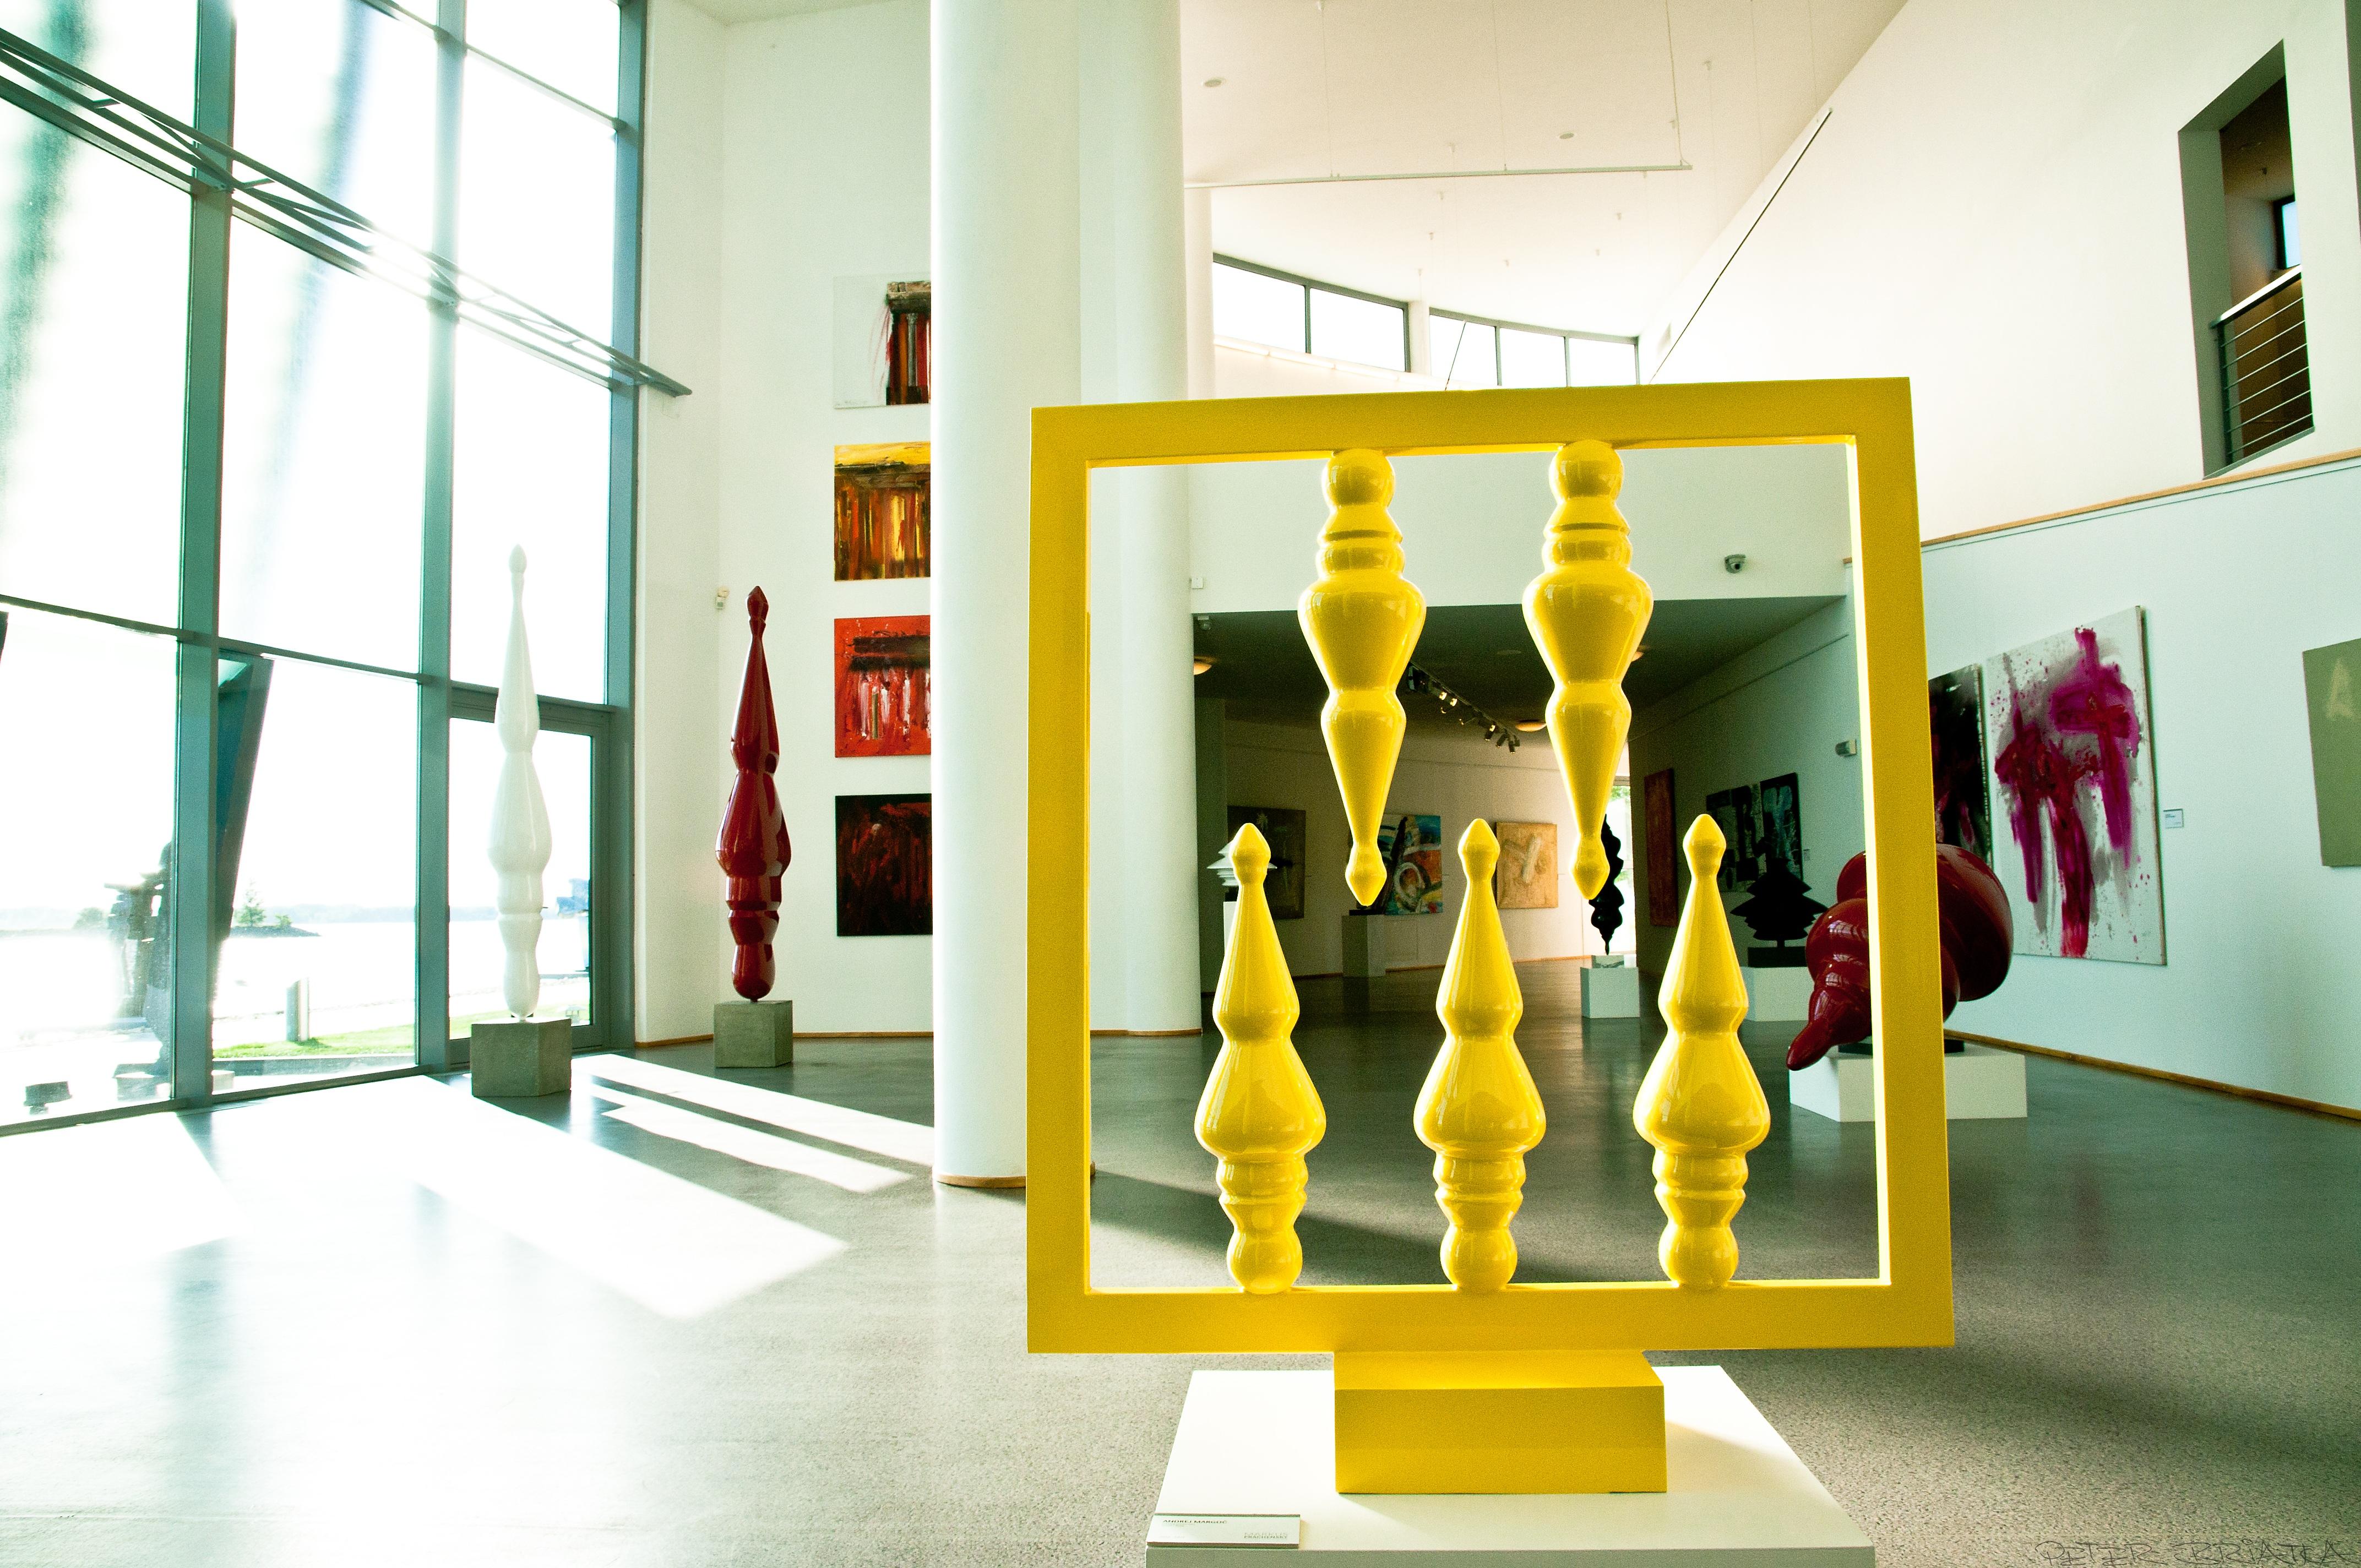 Free Images : light, architecture, museum, hall, square, interior ...